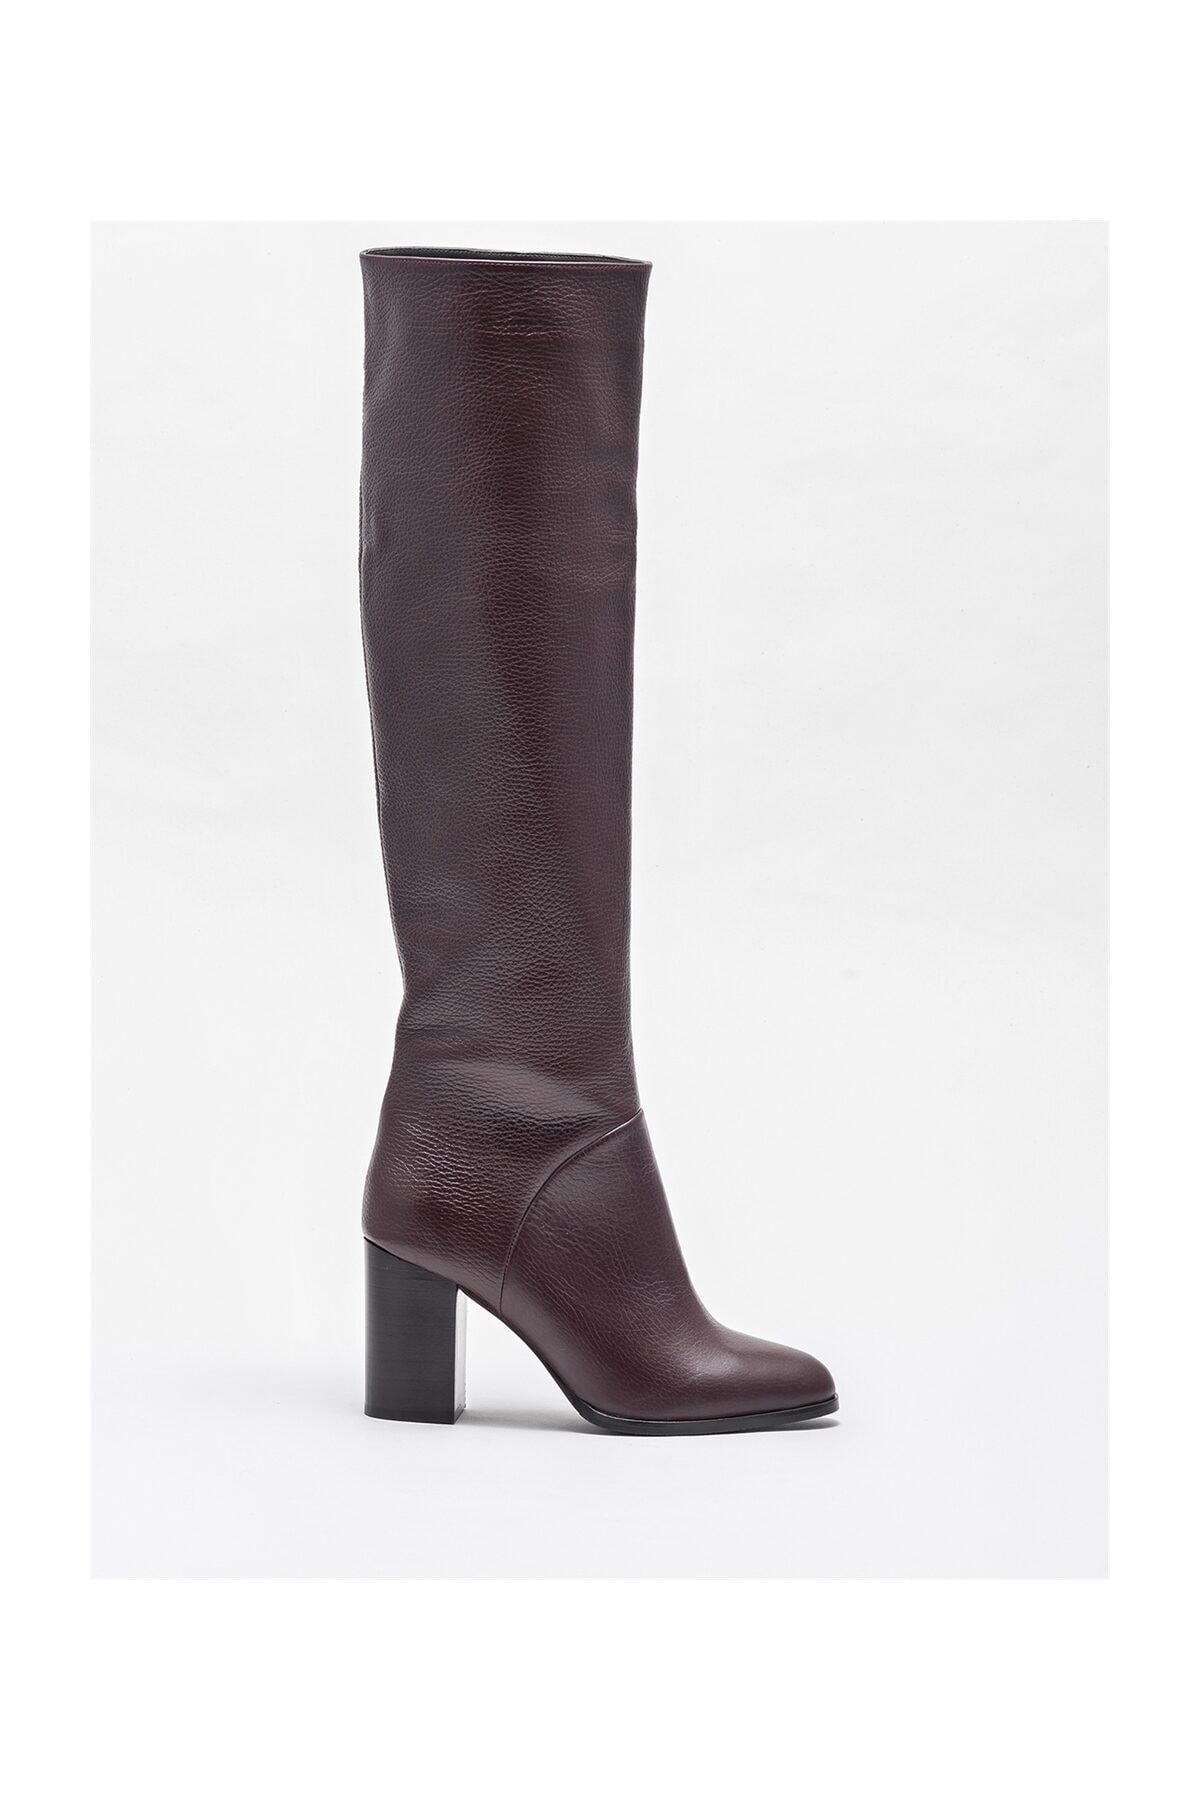 Elle Shoes Ranseys Kadın Çizme 20KTO18412 1